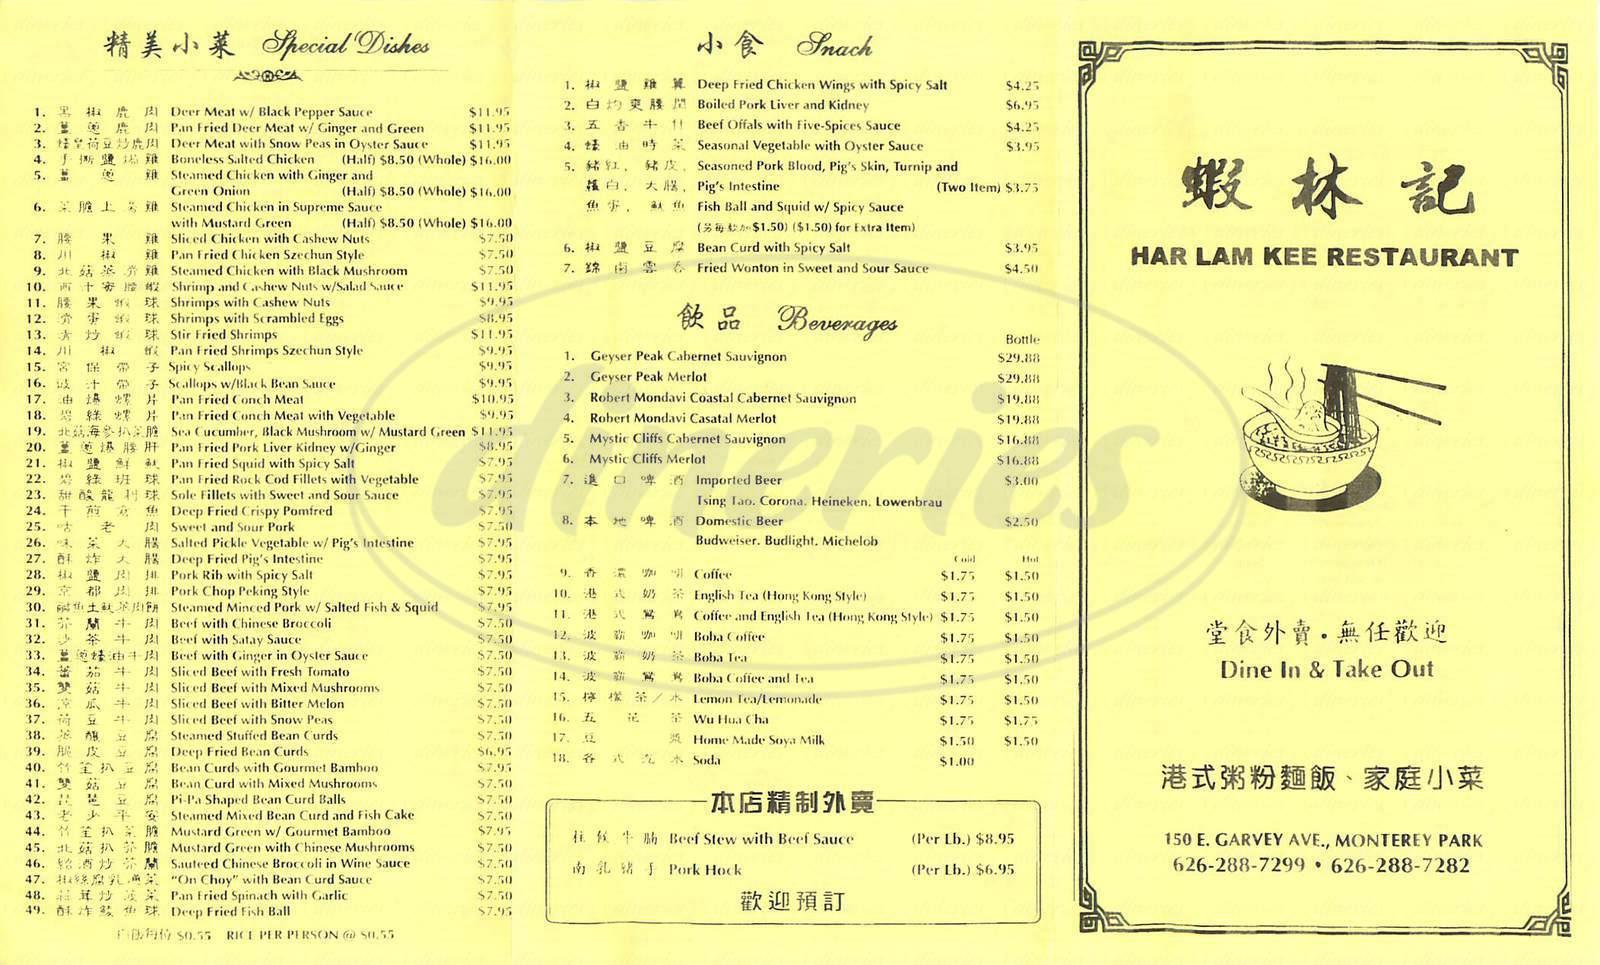 menu for Har Lam Kee Restaurant